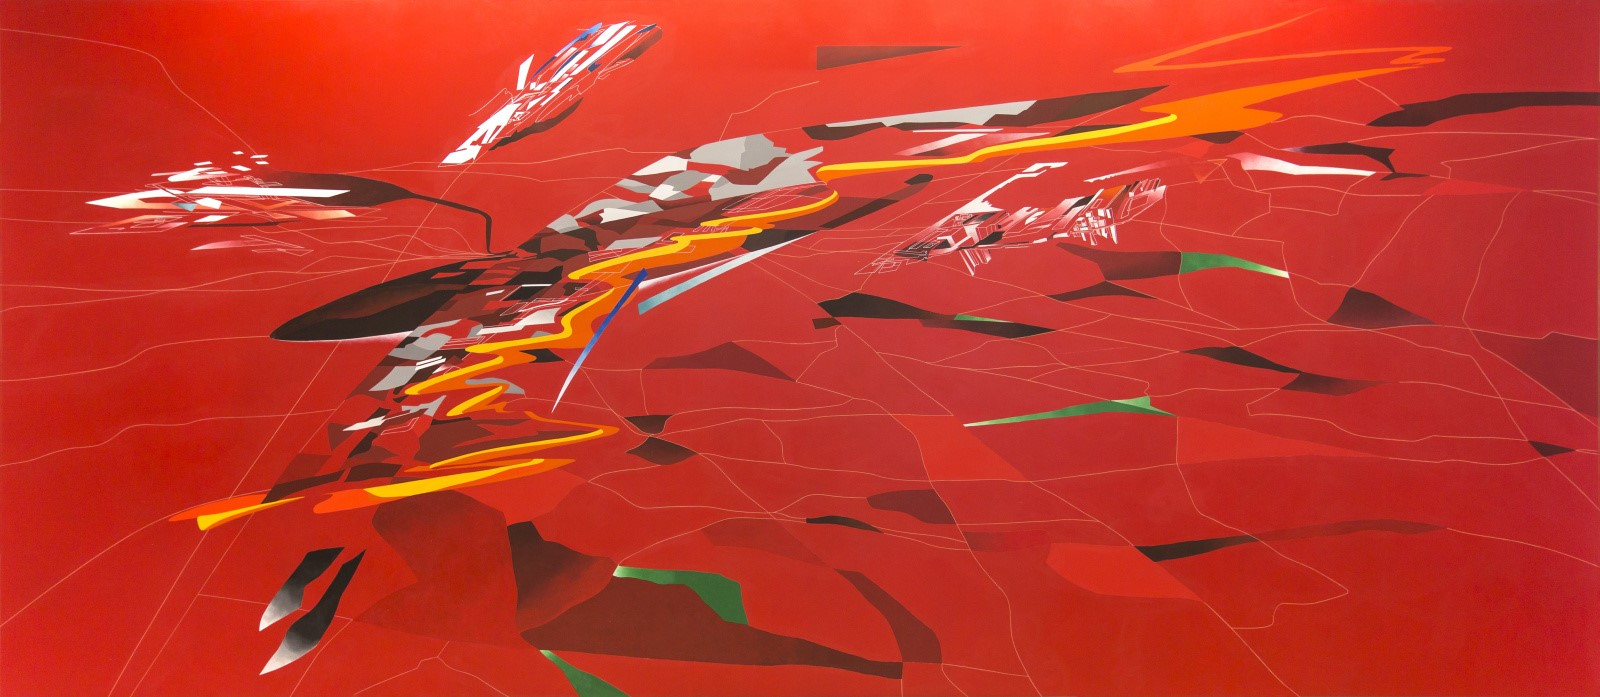 Metropolis painting (1988)